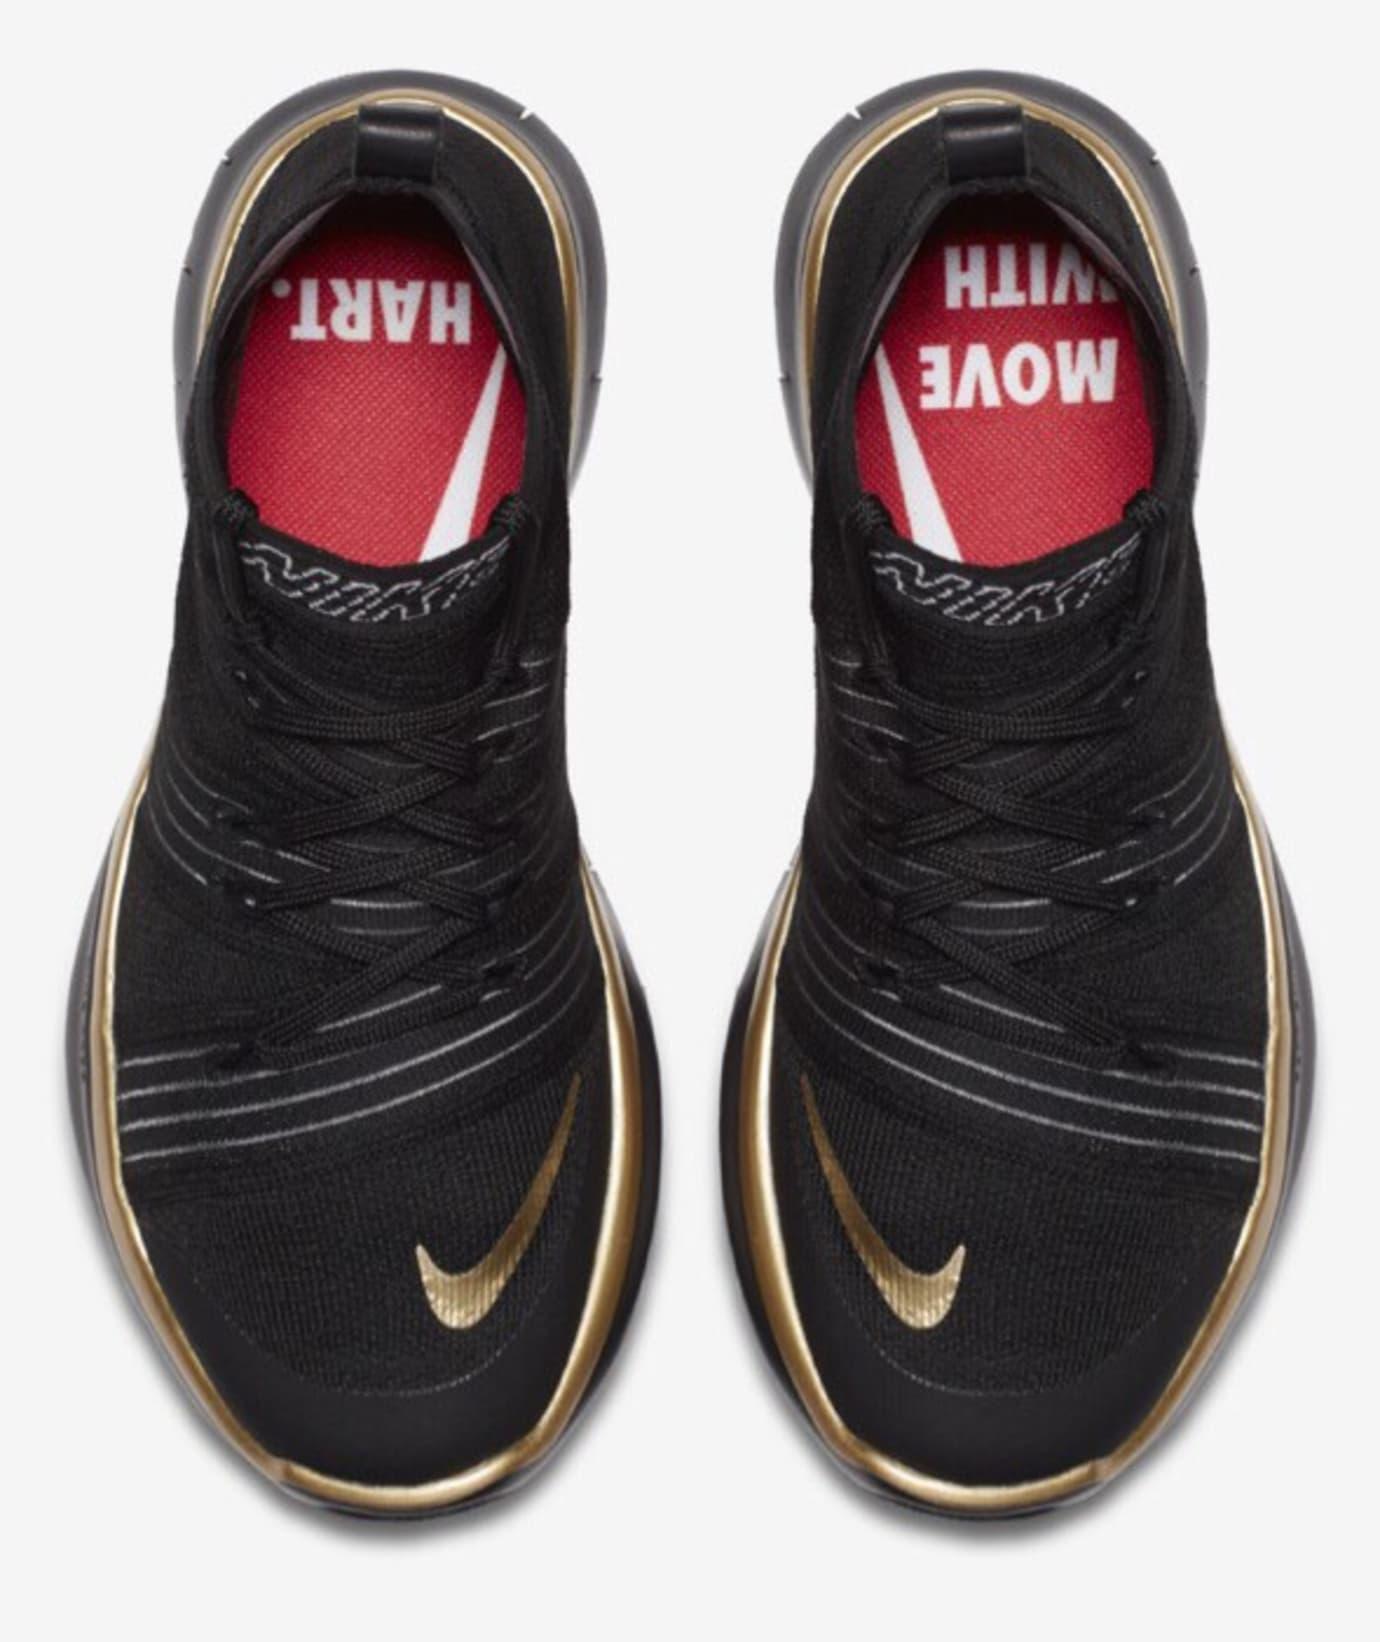 25a2e15229e7 Image via Nike Nike Free Train  Hustle Hart  Night (Top)